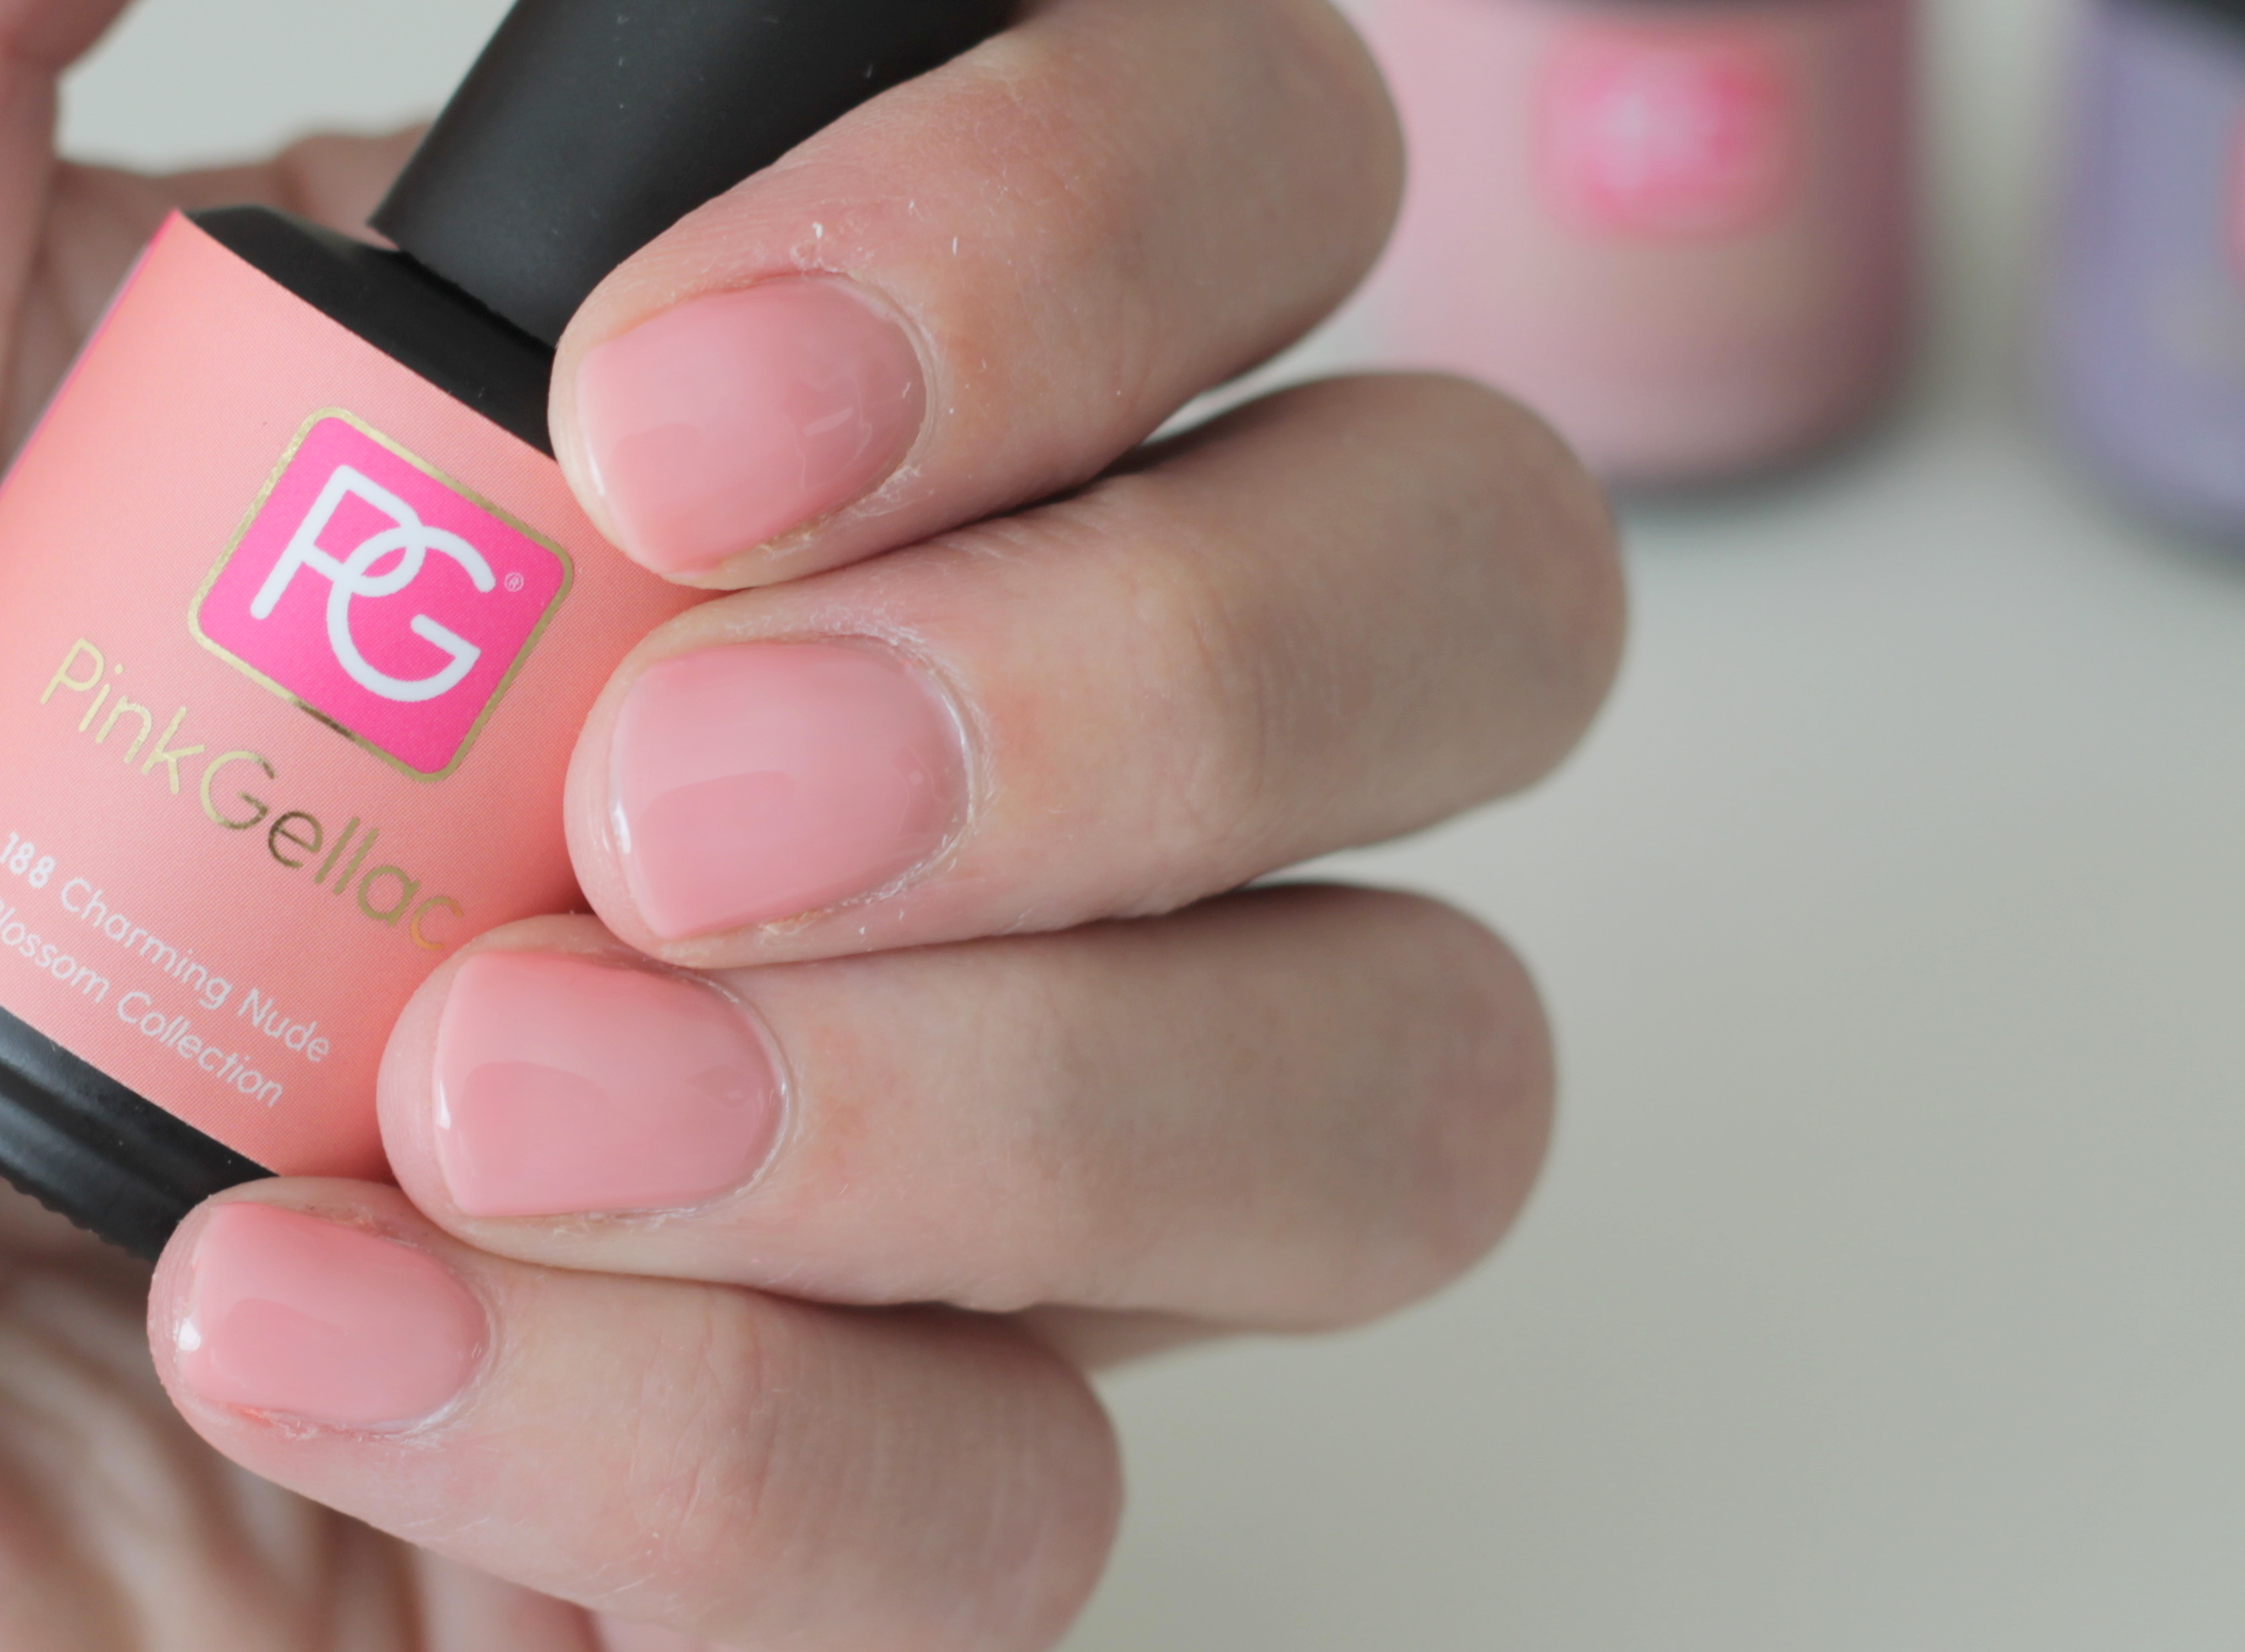 Pink Gellac Soft Purple, Nude Beige & Charming Nude